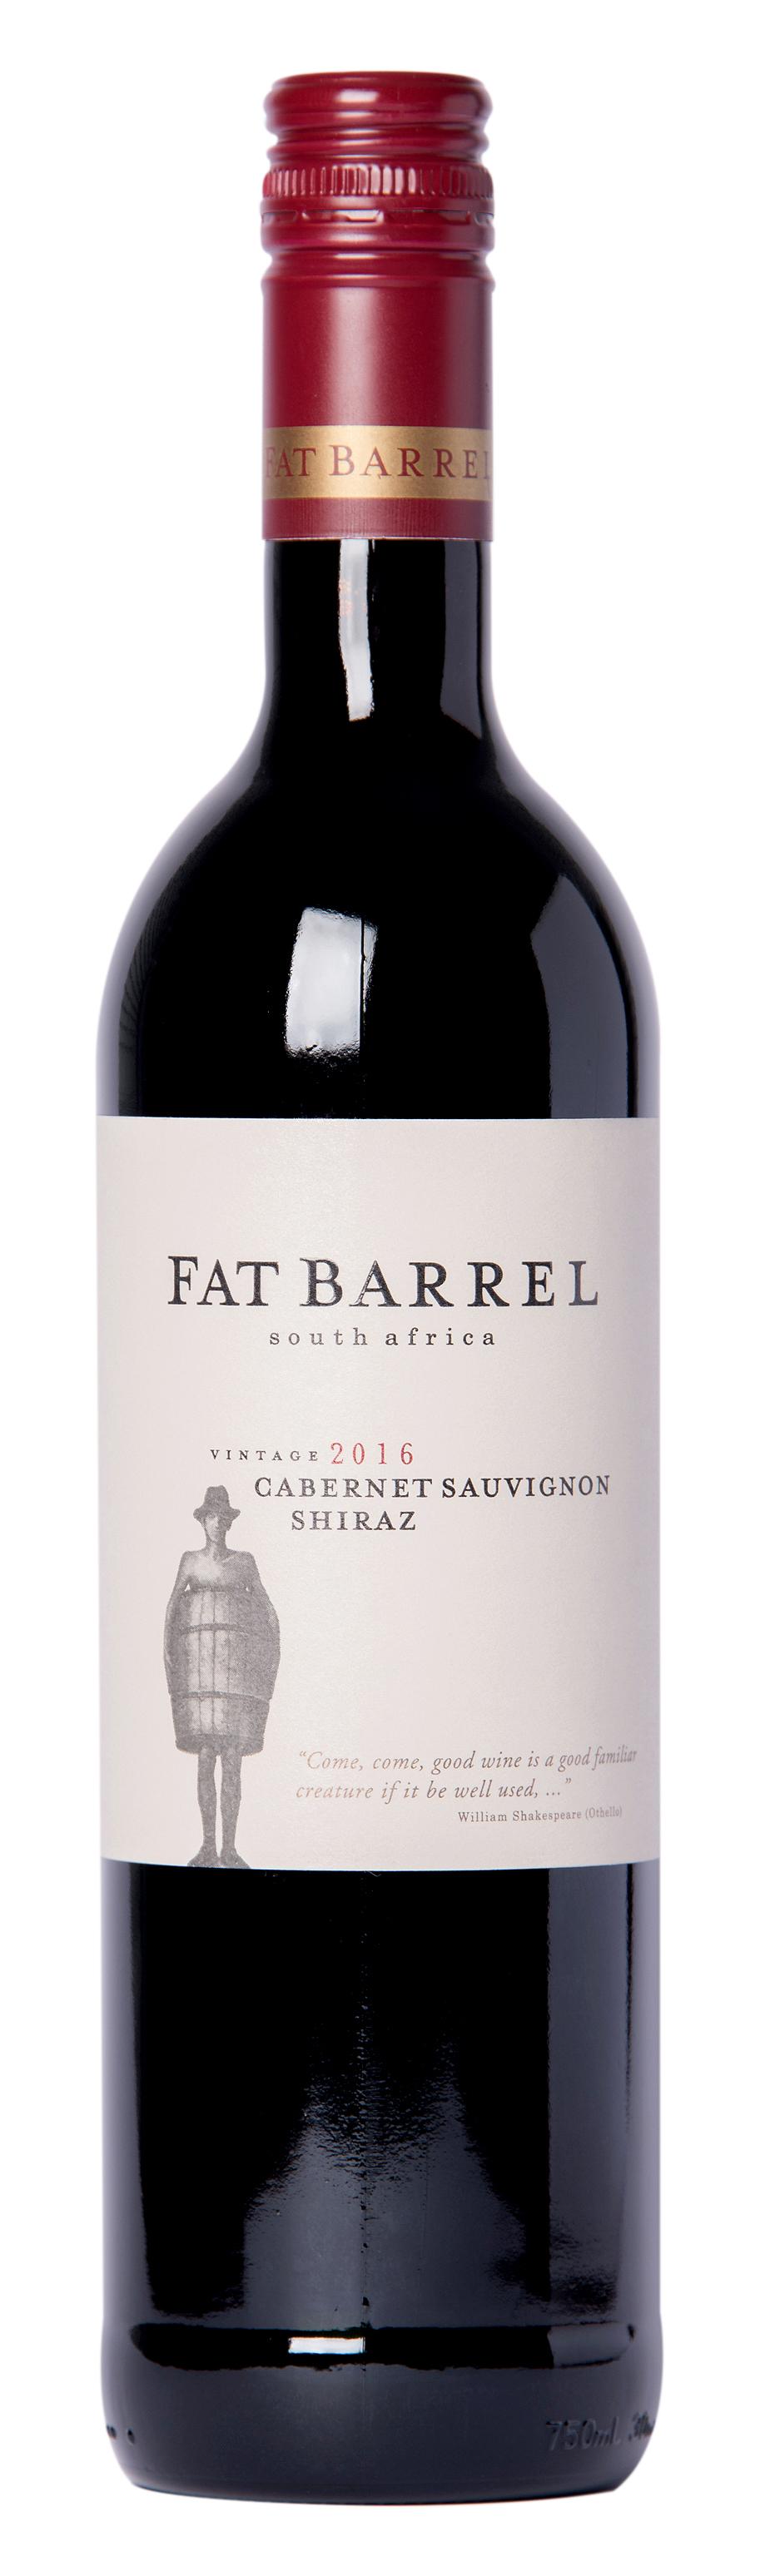 Fat Barrel Cabernet Sauvignon Shiraz 75cl